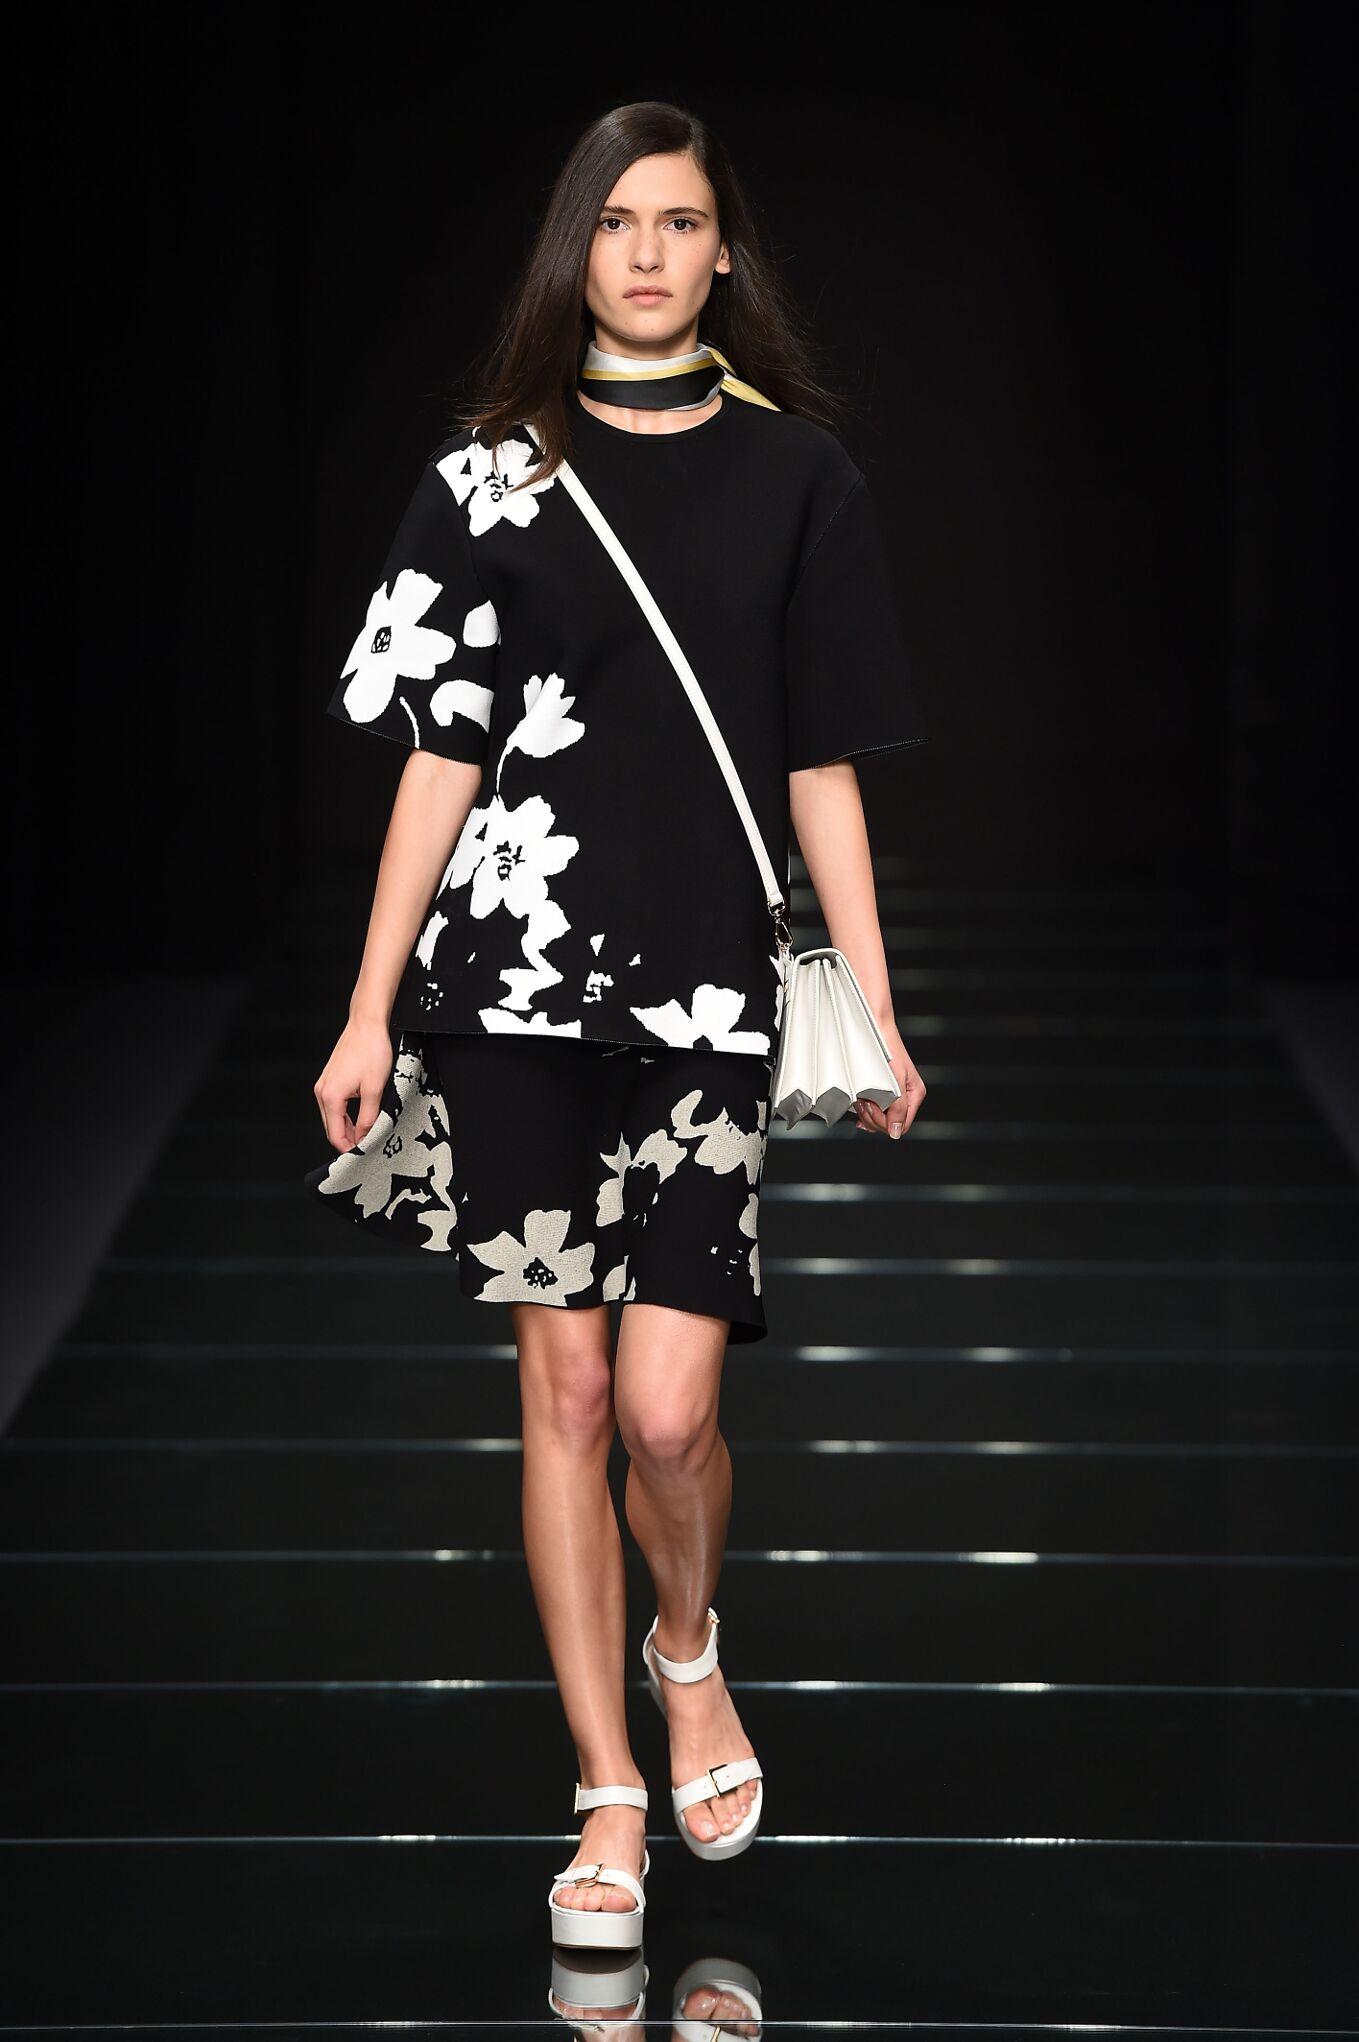 2015 Anteprima Womanswear